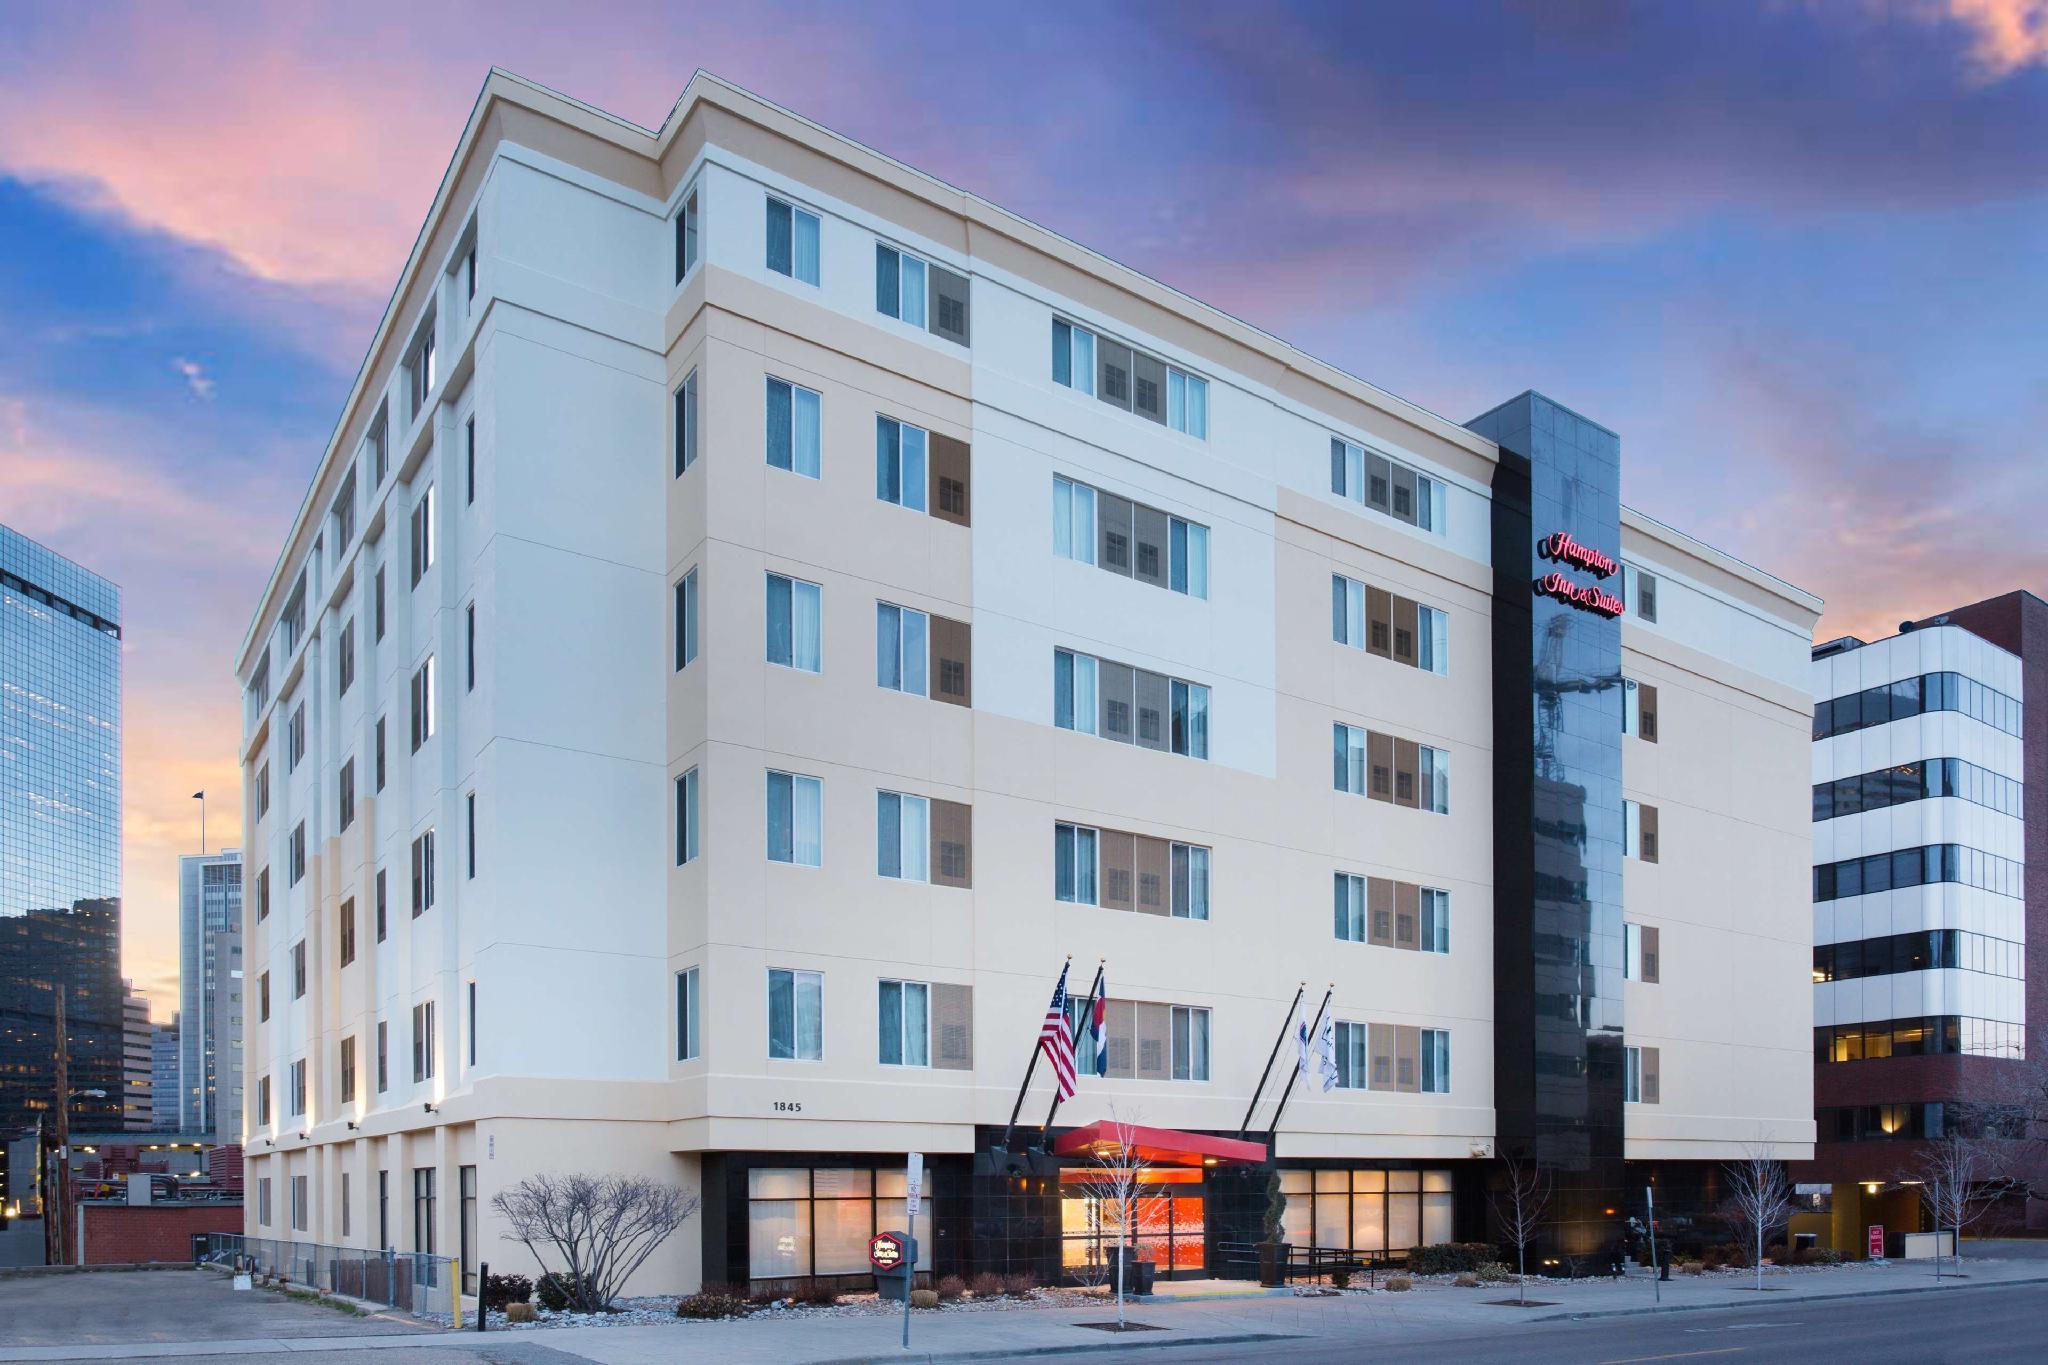 Vasca Da Letto Per Disabili : Hampton inn & suites denver downtown hotel denver co affari